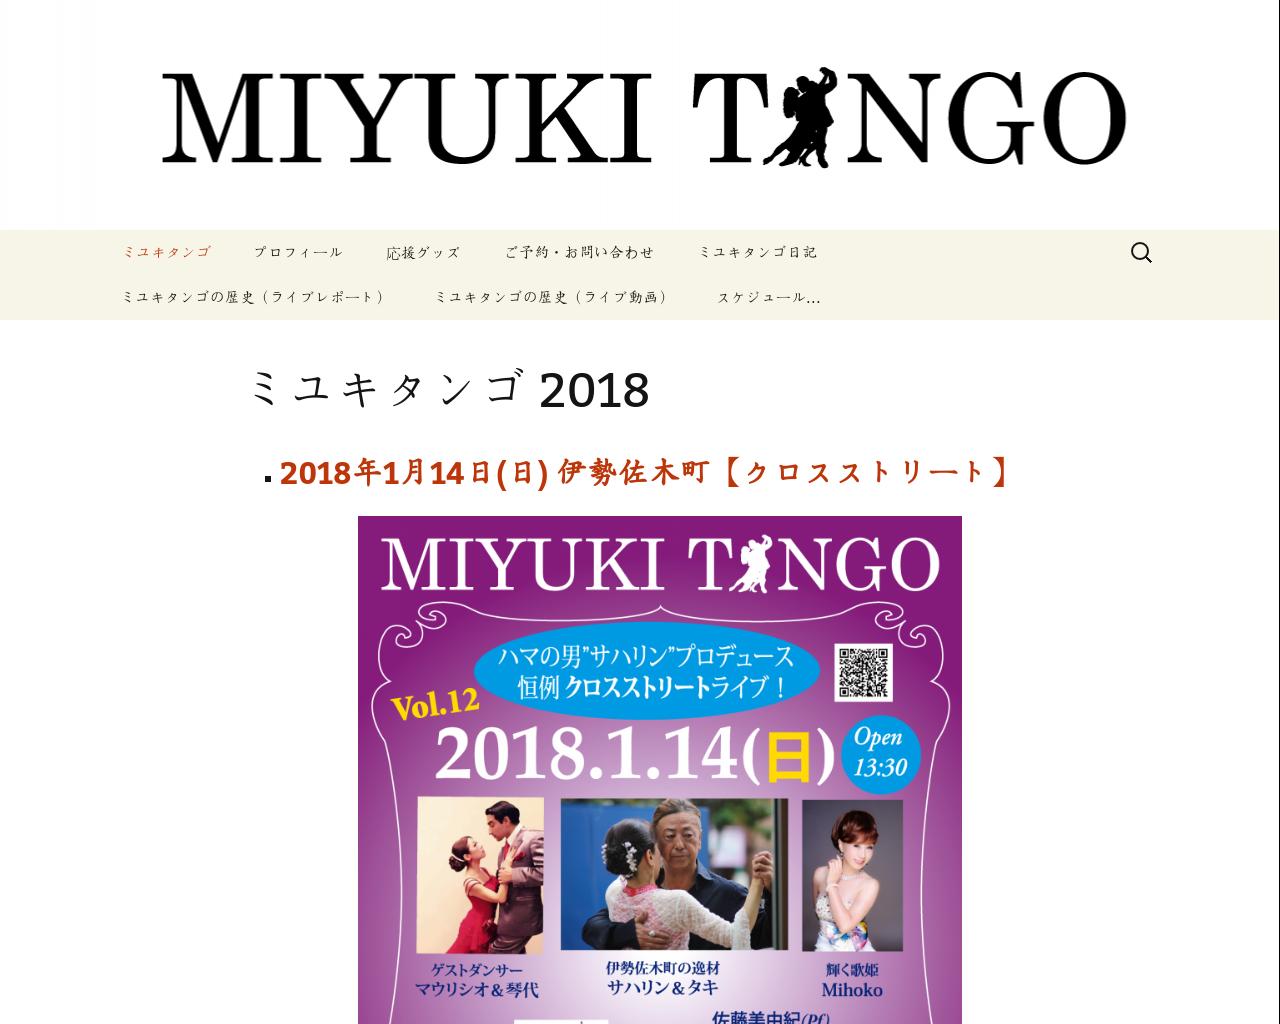 www.miyukitango.com(2018/01/12 21:21:45)